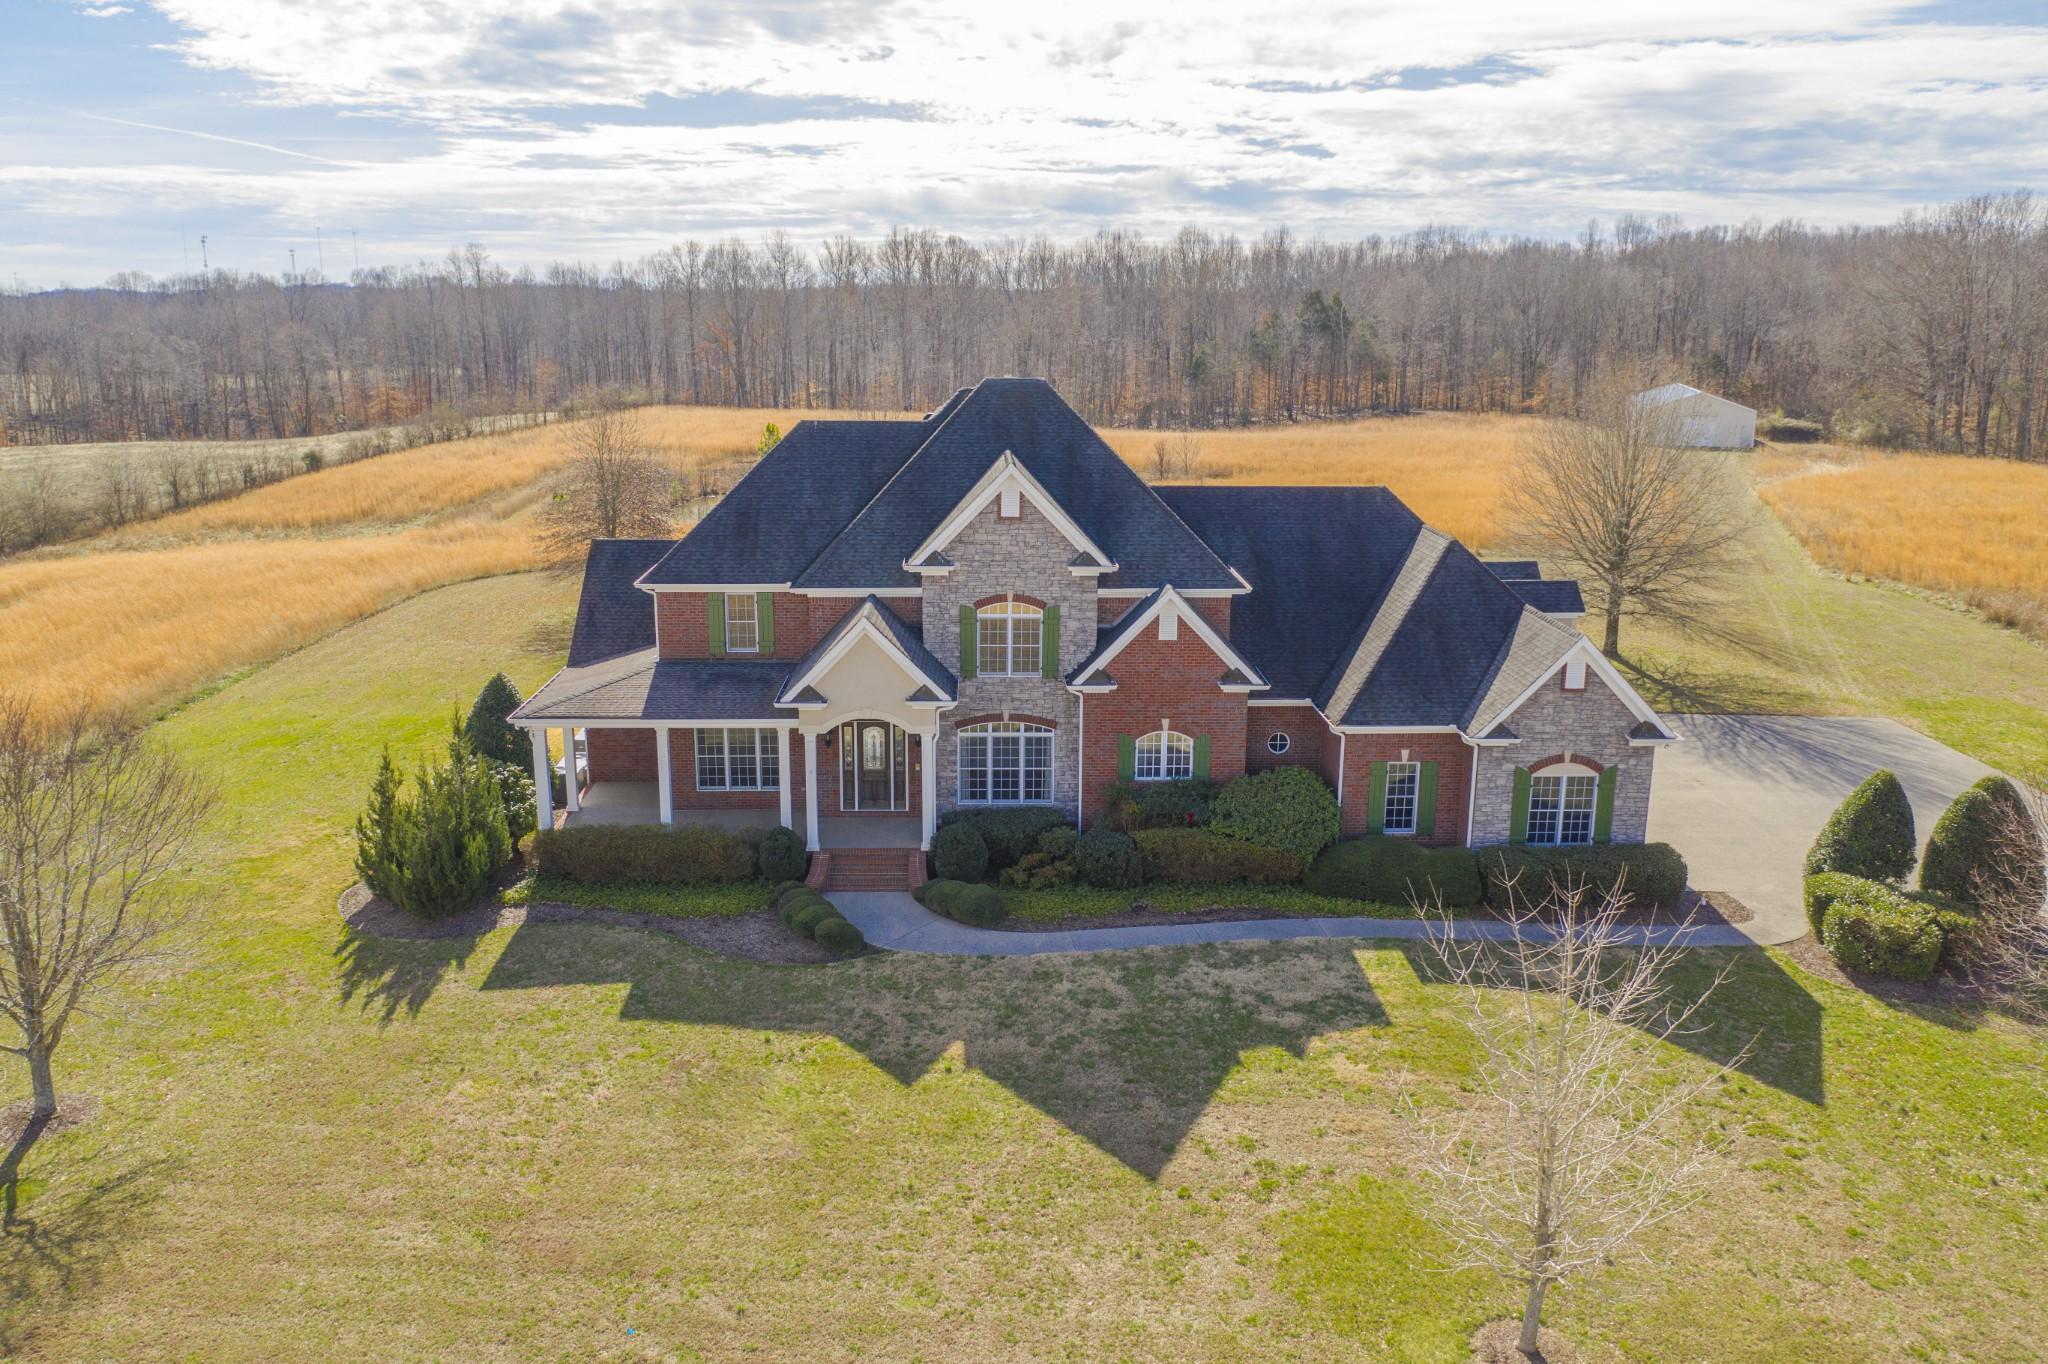 2901 Union Hill Rd, Joelton, TN 37080 - Joelton, TN real estate listing